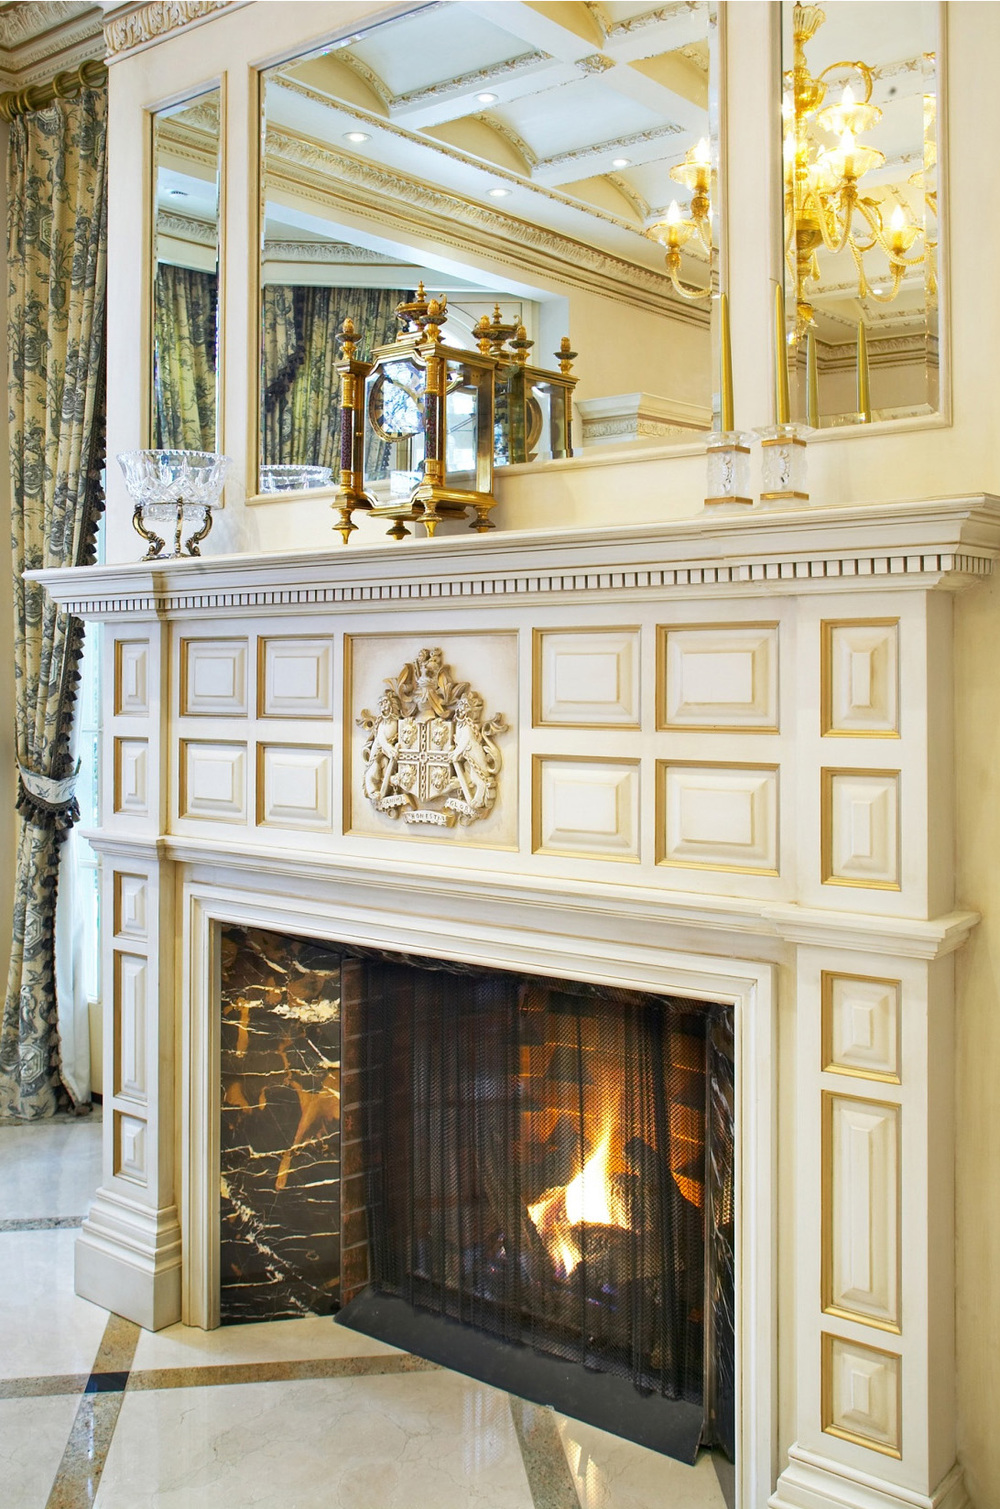 77-LR fireplace.jpg